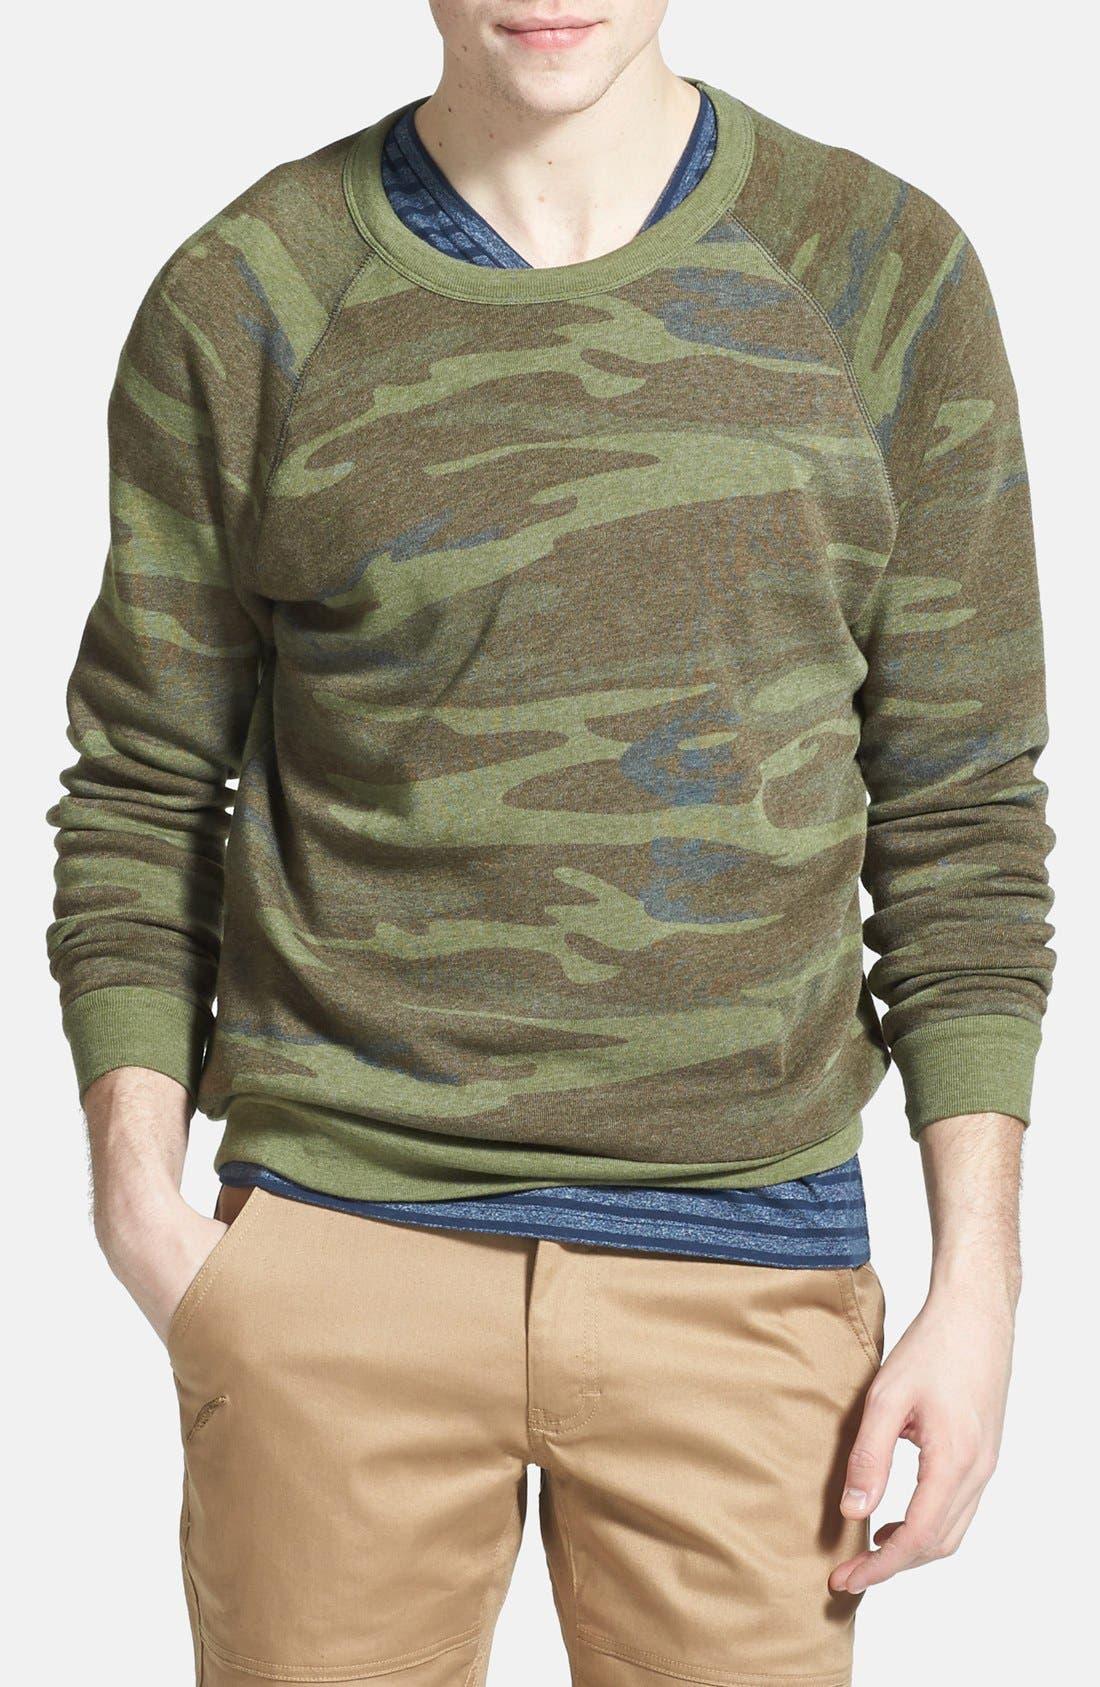 'The Champ' Camo Print Crewneck Sweatshirt,                         Main,                         color, 300